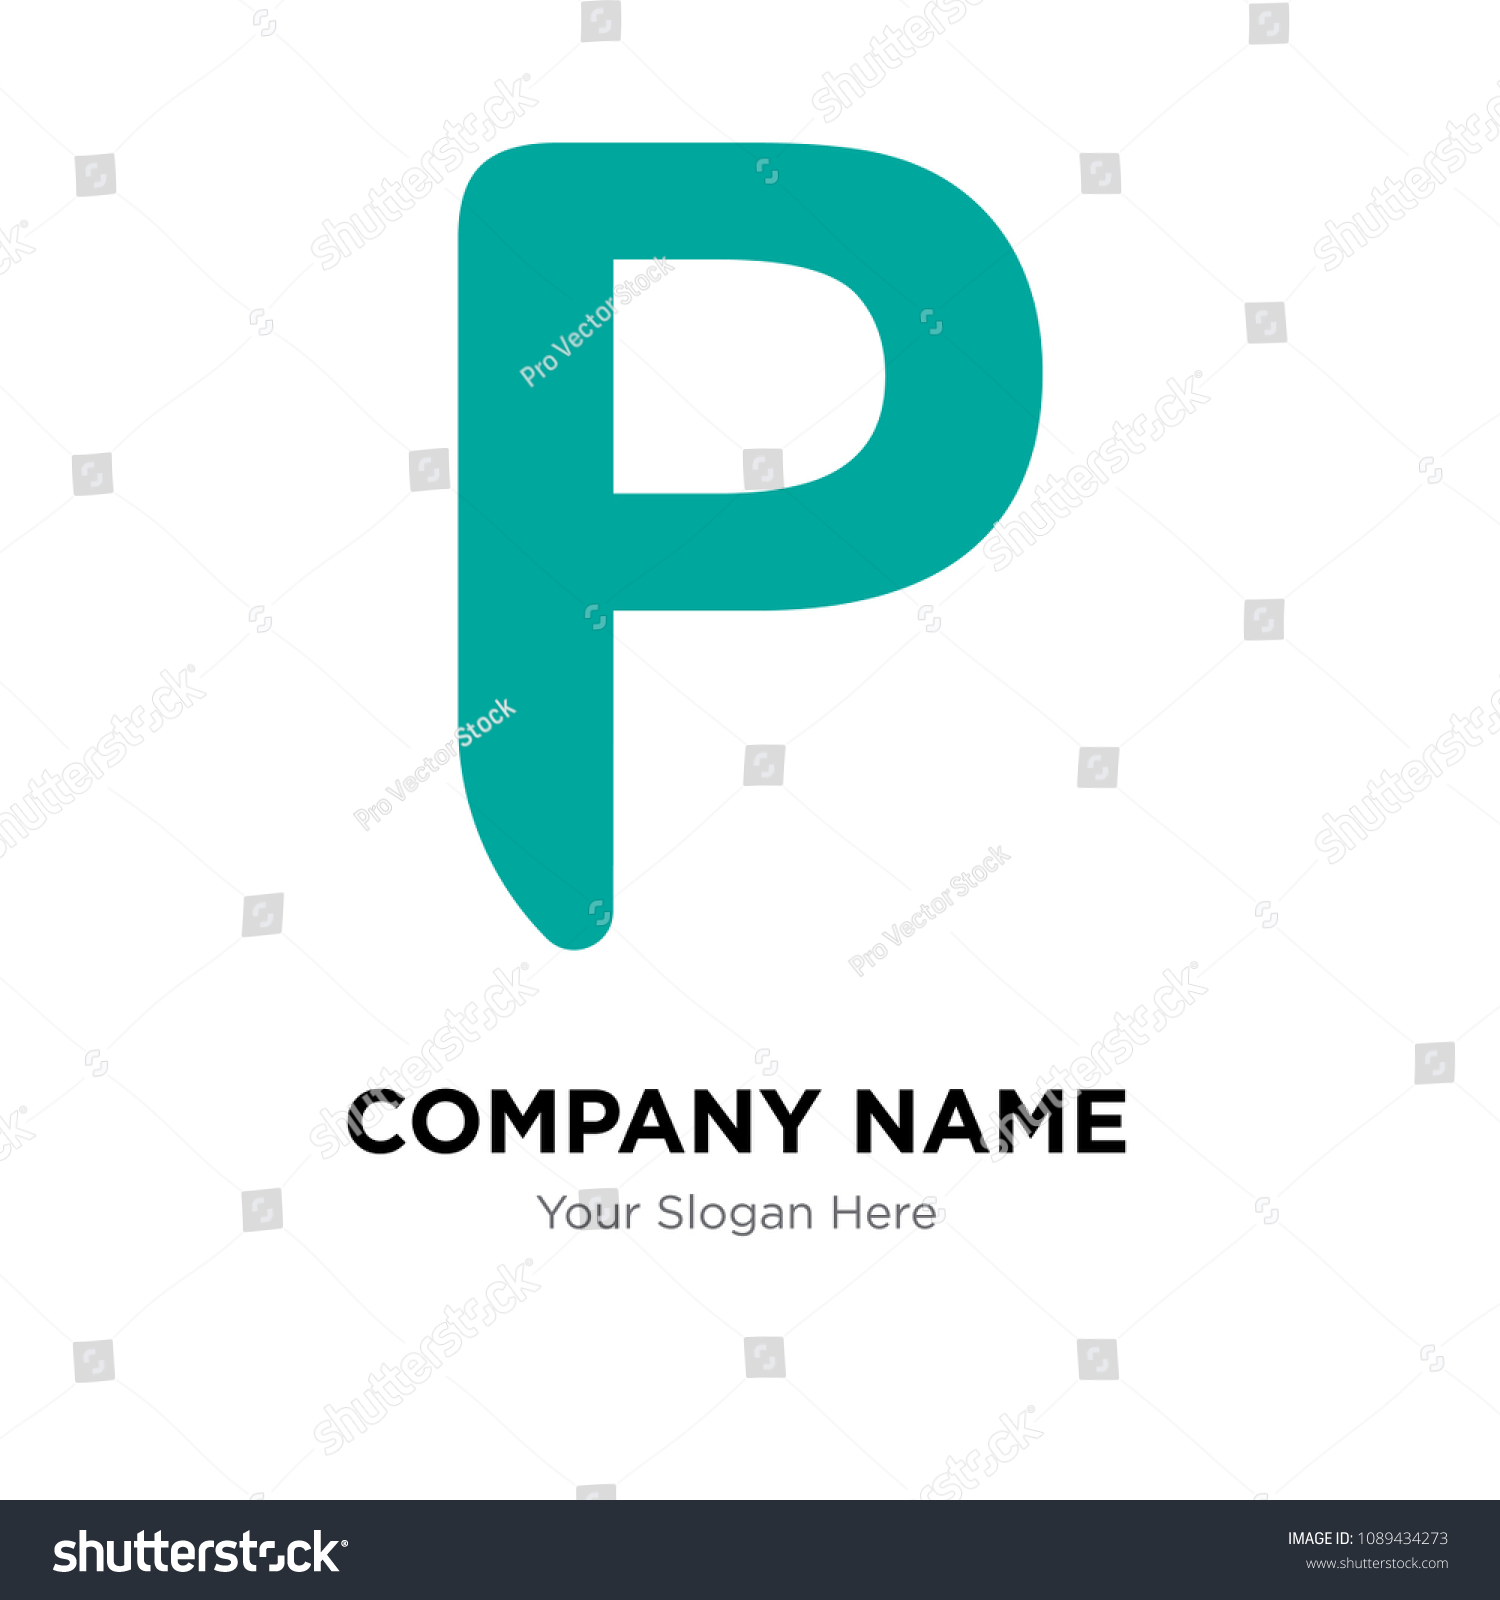 Botswana Currency Company Logo Design Template Stock Vector